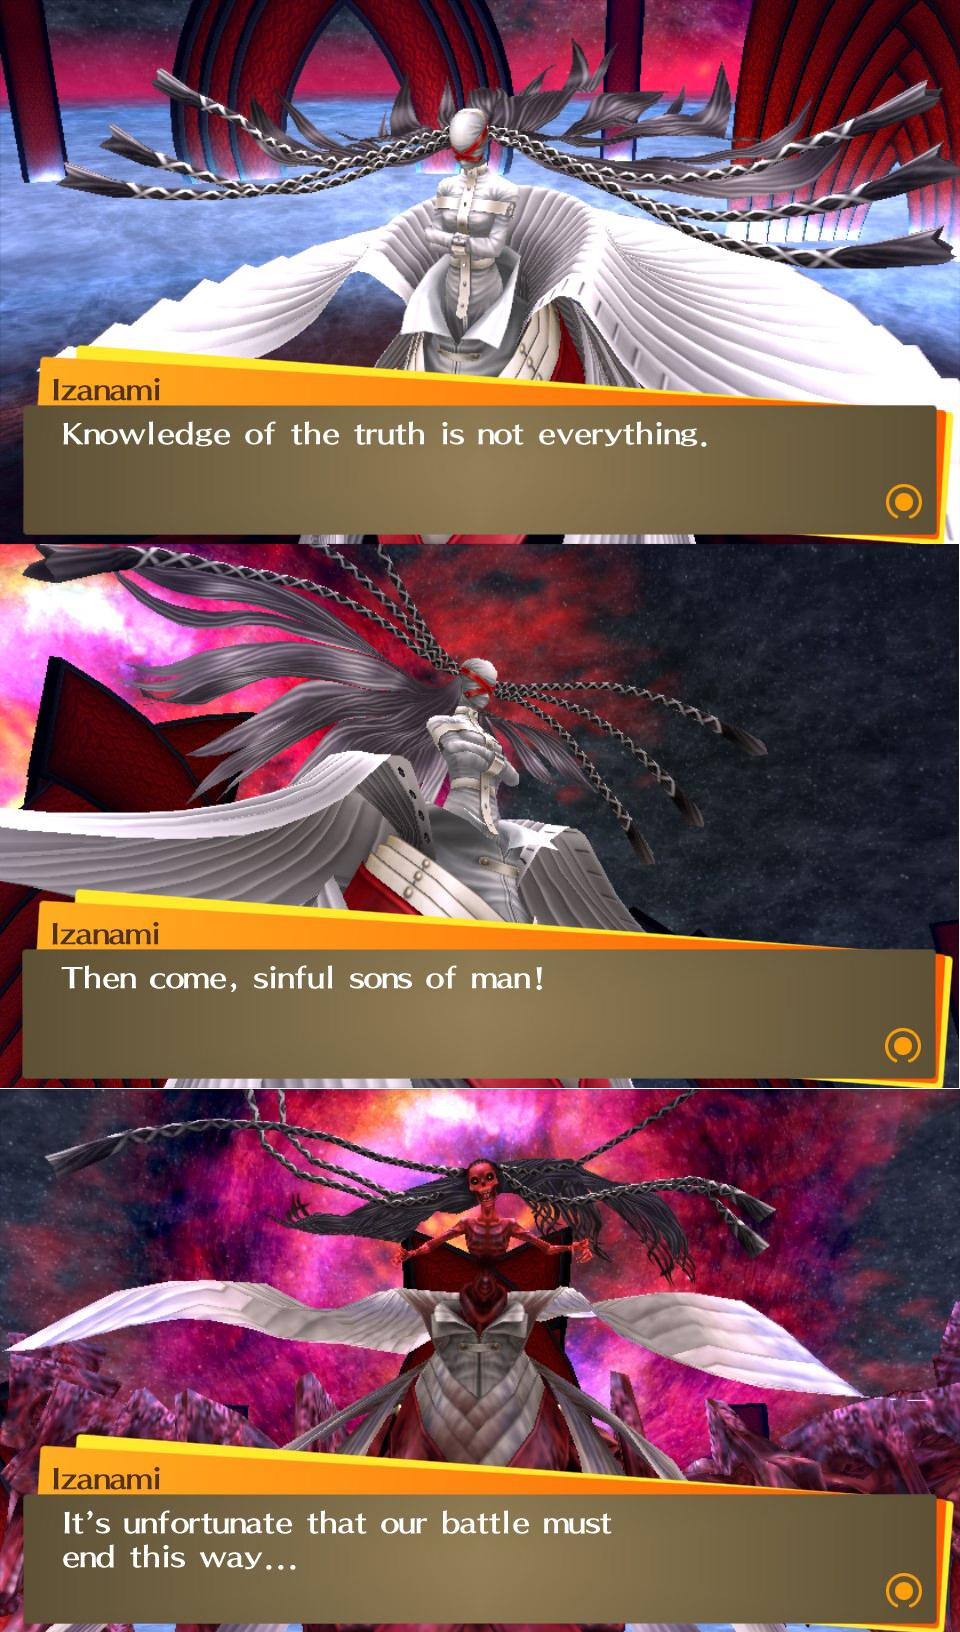 Izanami Persona 4: The Golden; Pictorial!